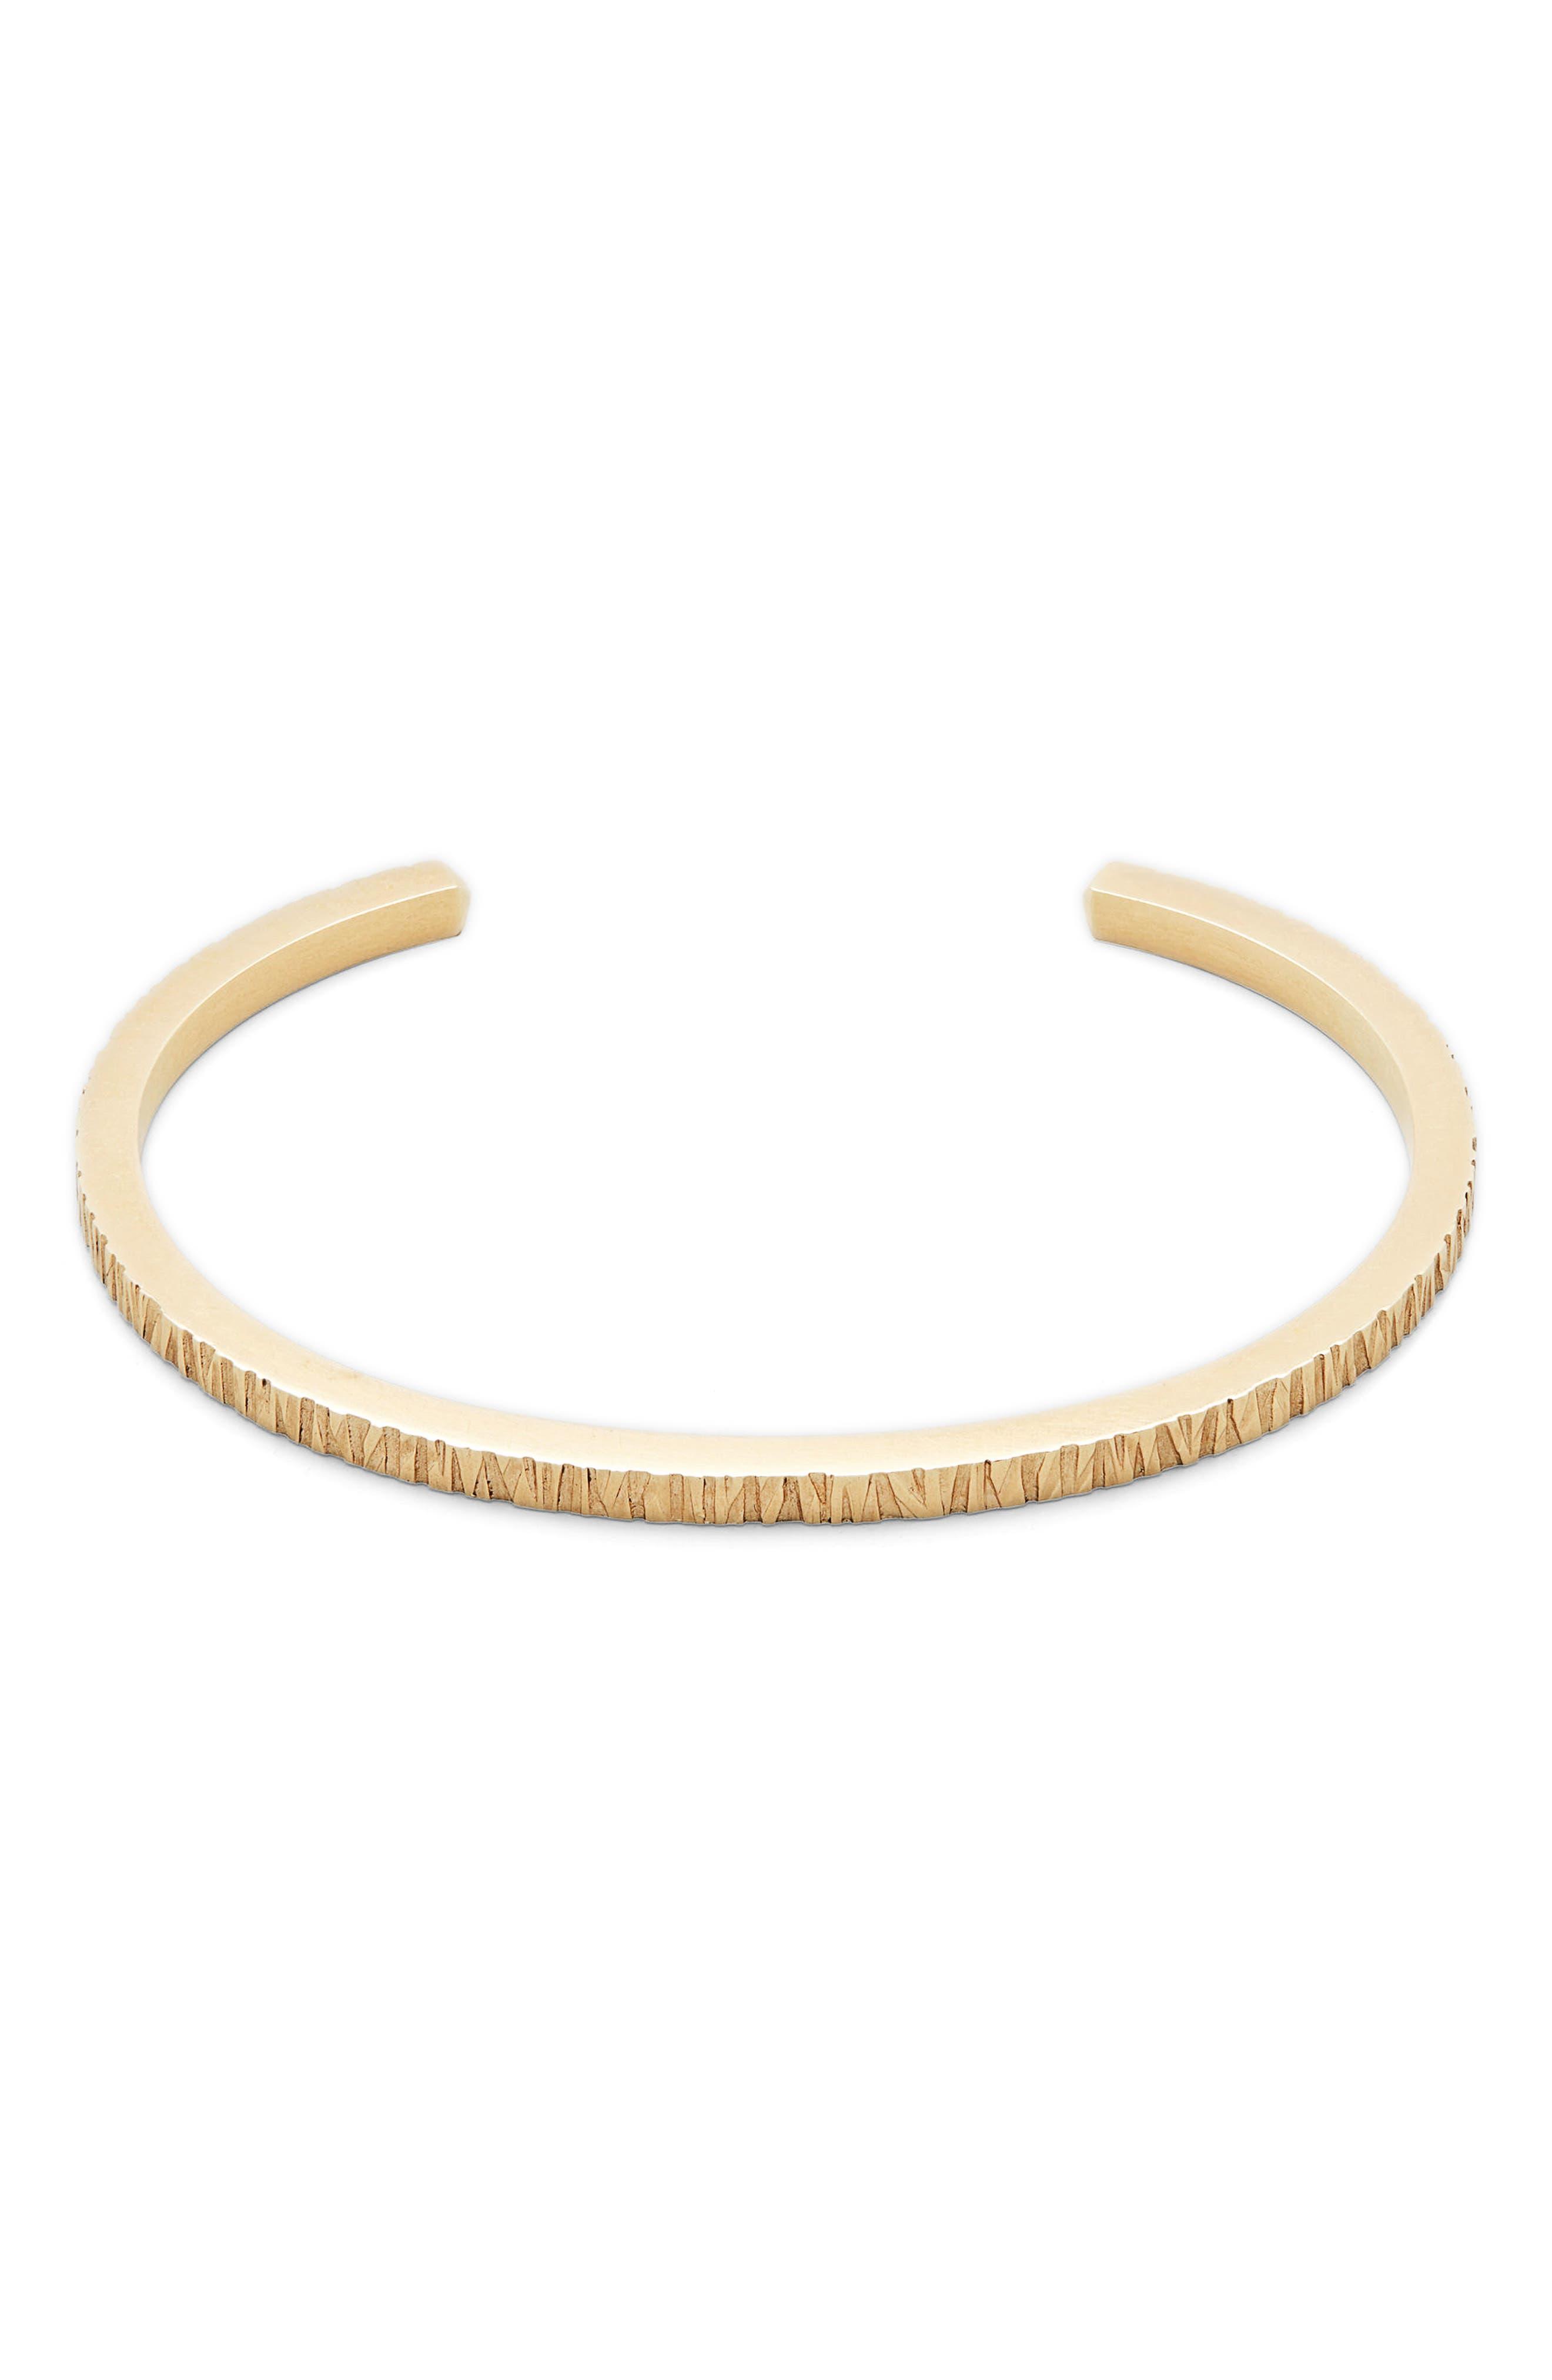 Structured Cuff Bracelet,                         Main,                         color, 9K GOLD